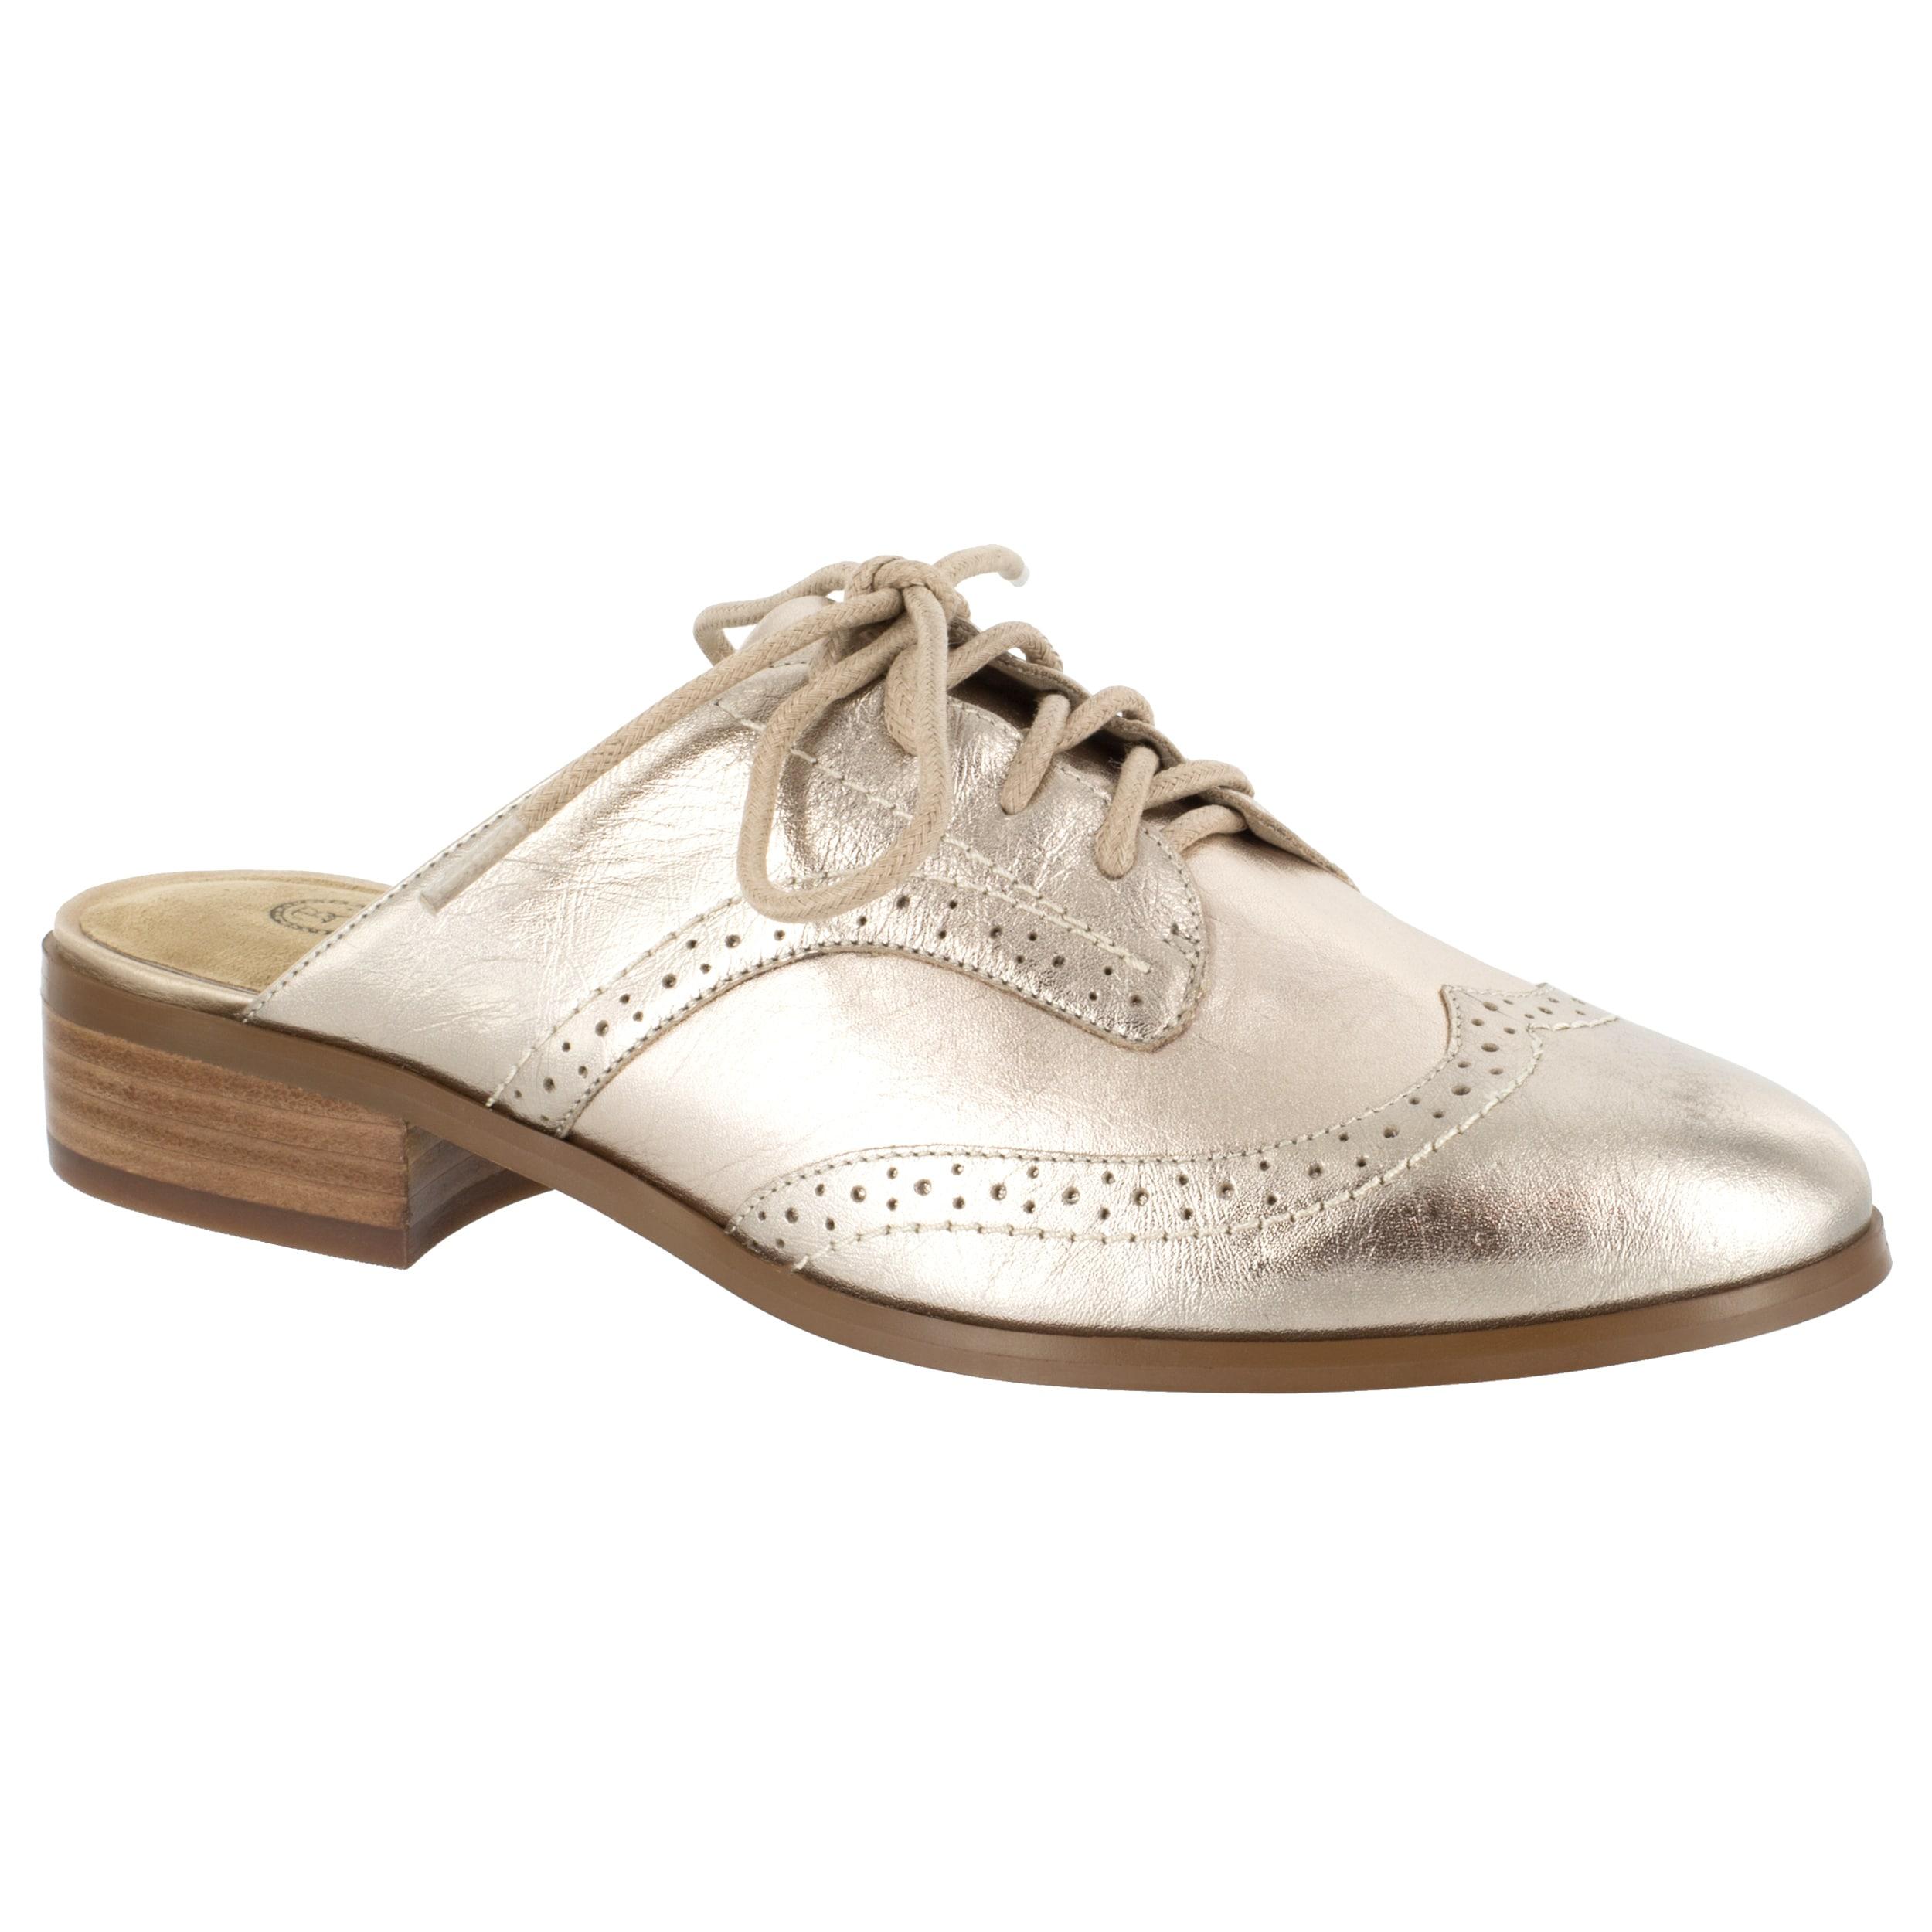 Bella Vita Women's Baxter Mule Metallic Leather Shoes by Overstock